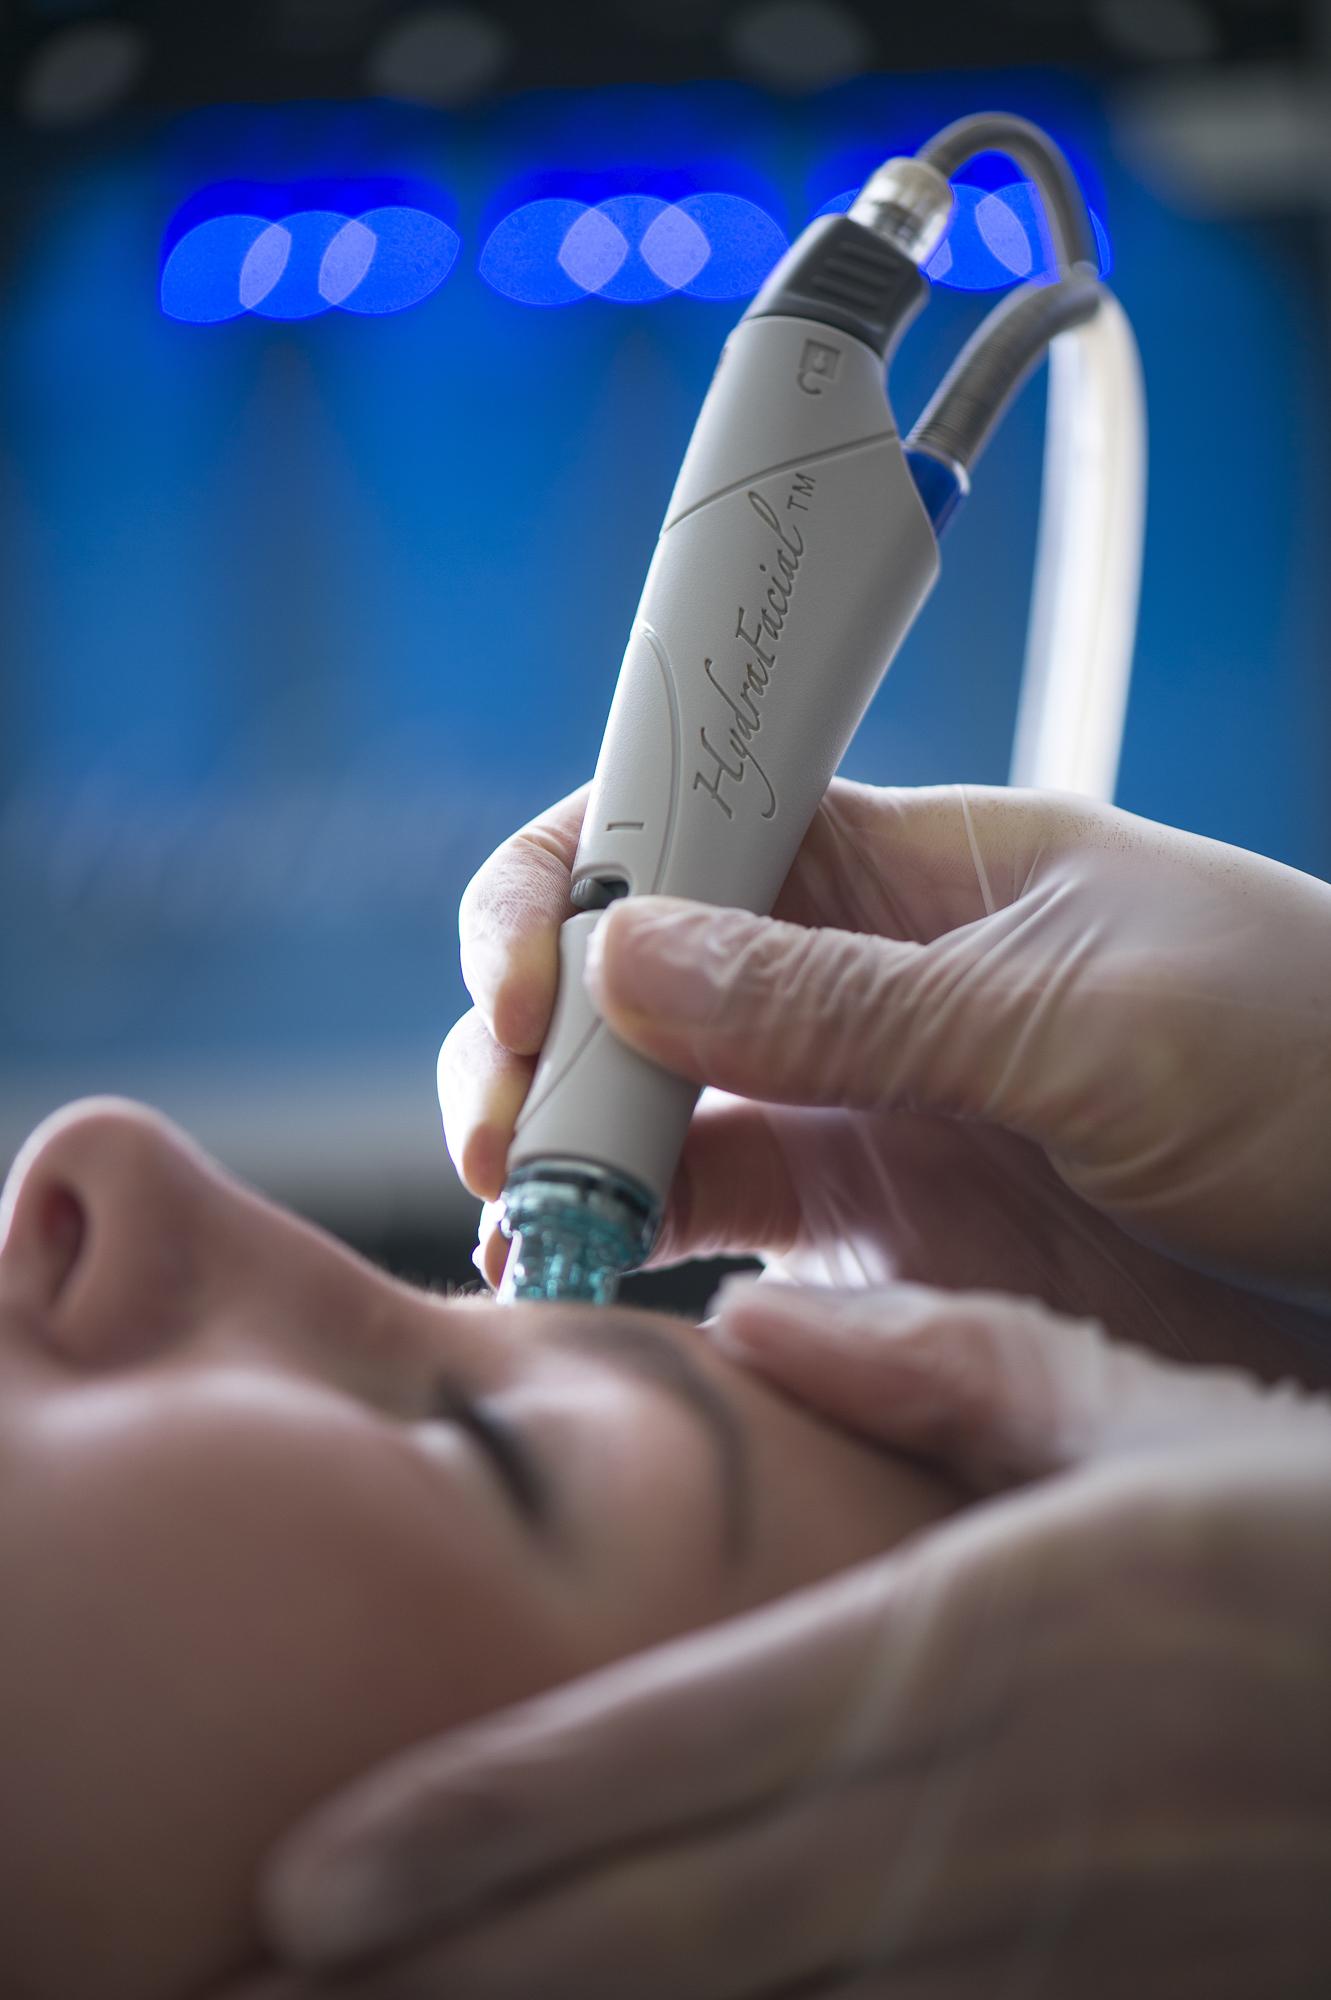 Avenue Plastic Surgery, HydraFacial treatment